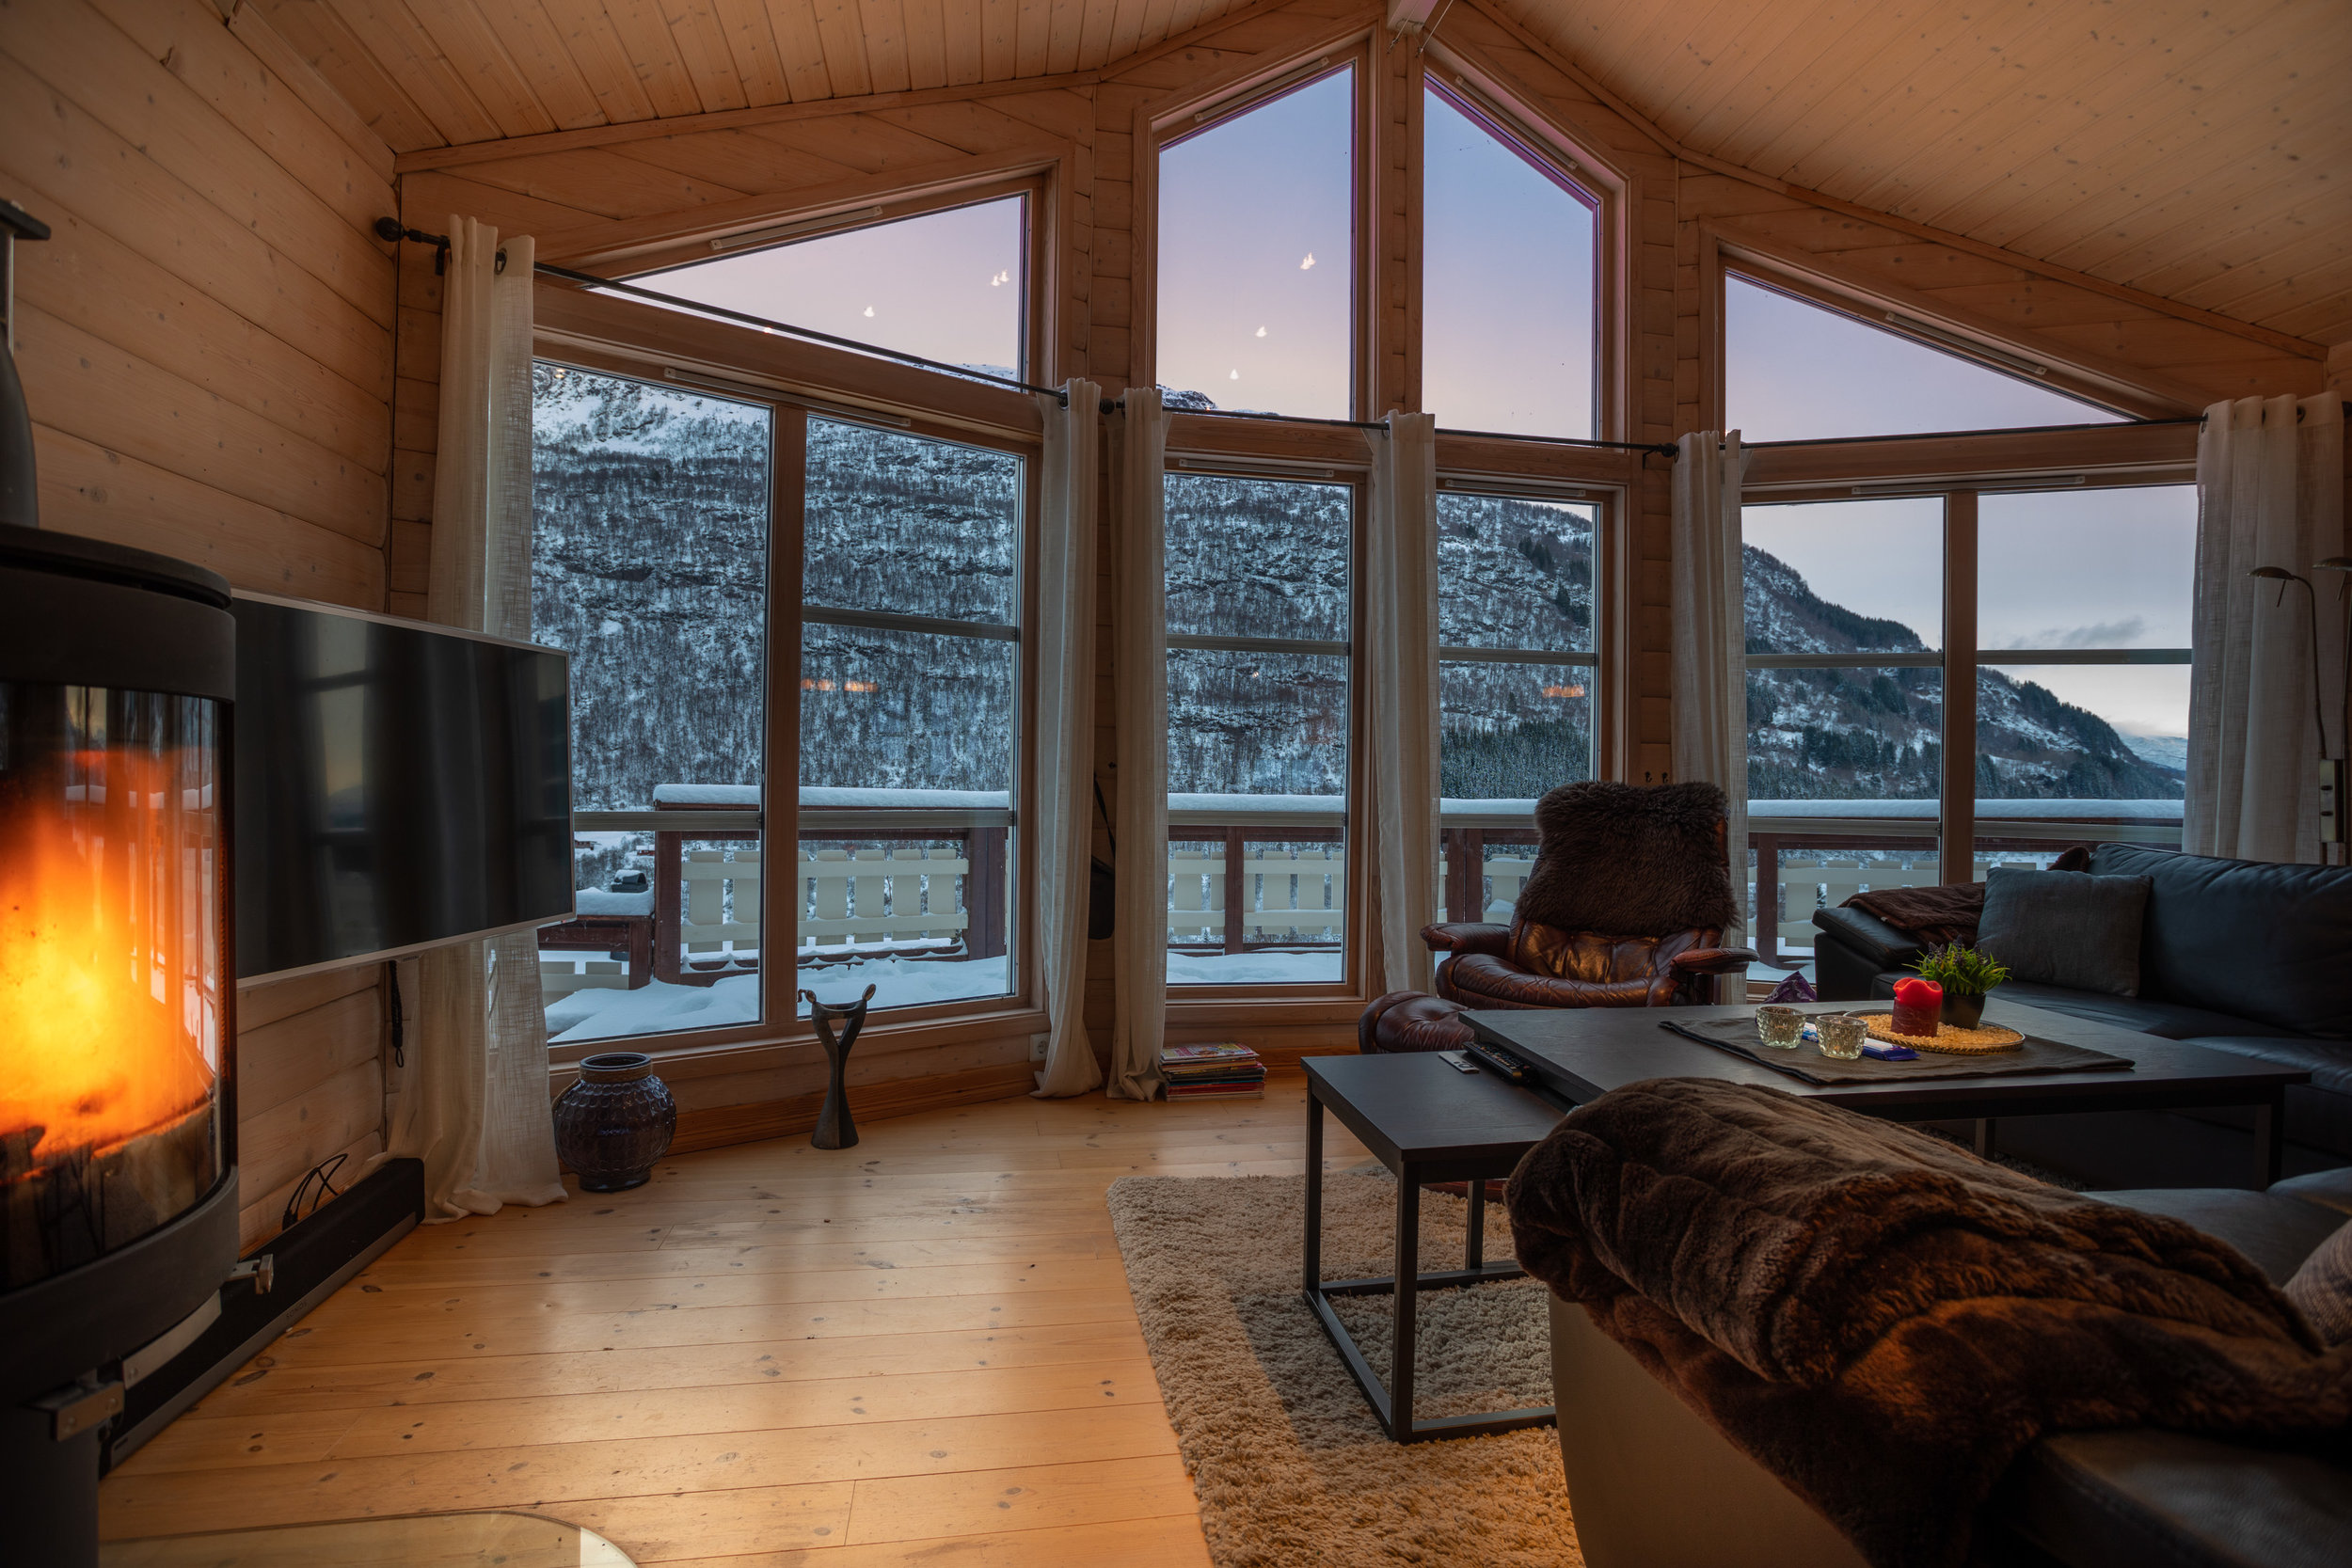 20190109-solberg-hytte-hodlekve-Kos.jpg